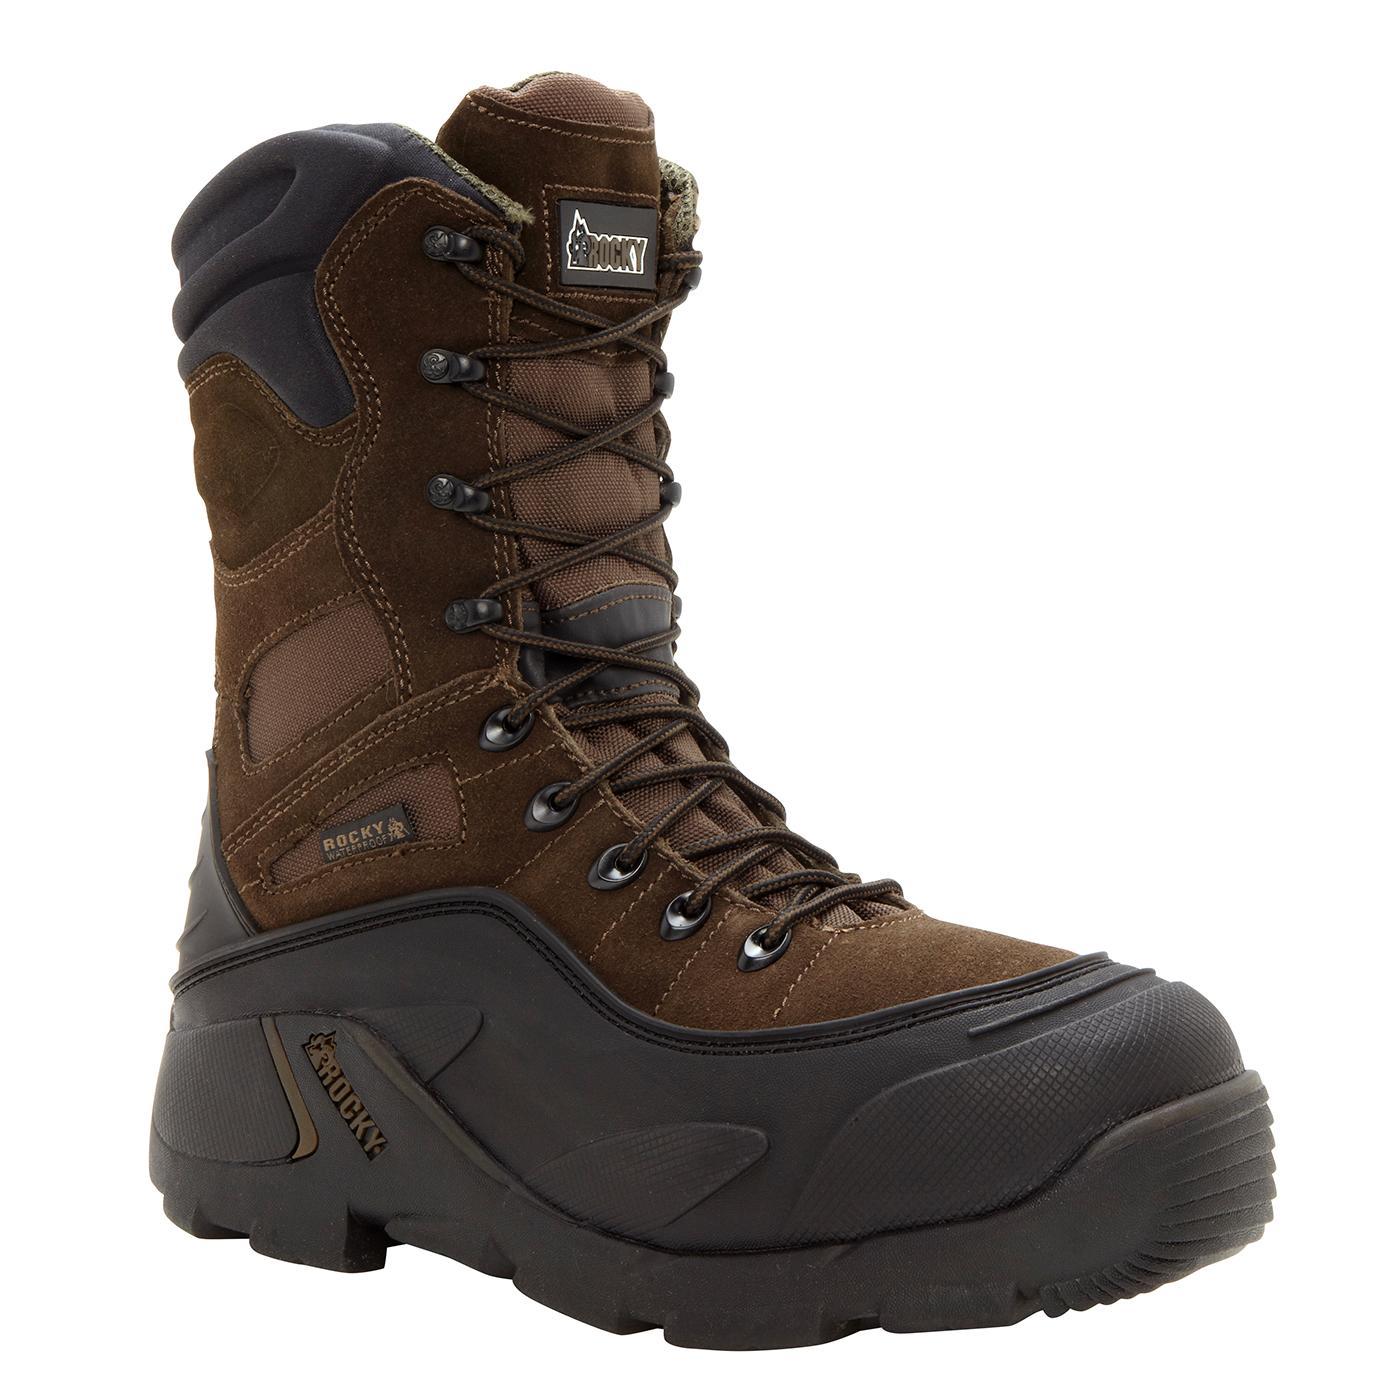 Men S Steel Toe Waterproof Insulated Work Boot The Rocky